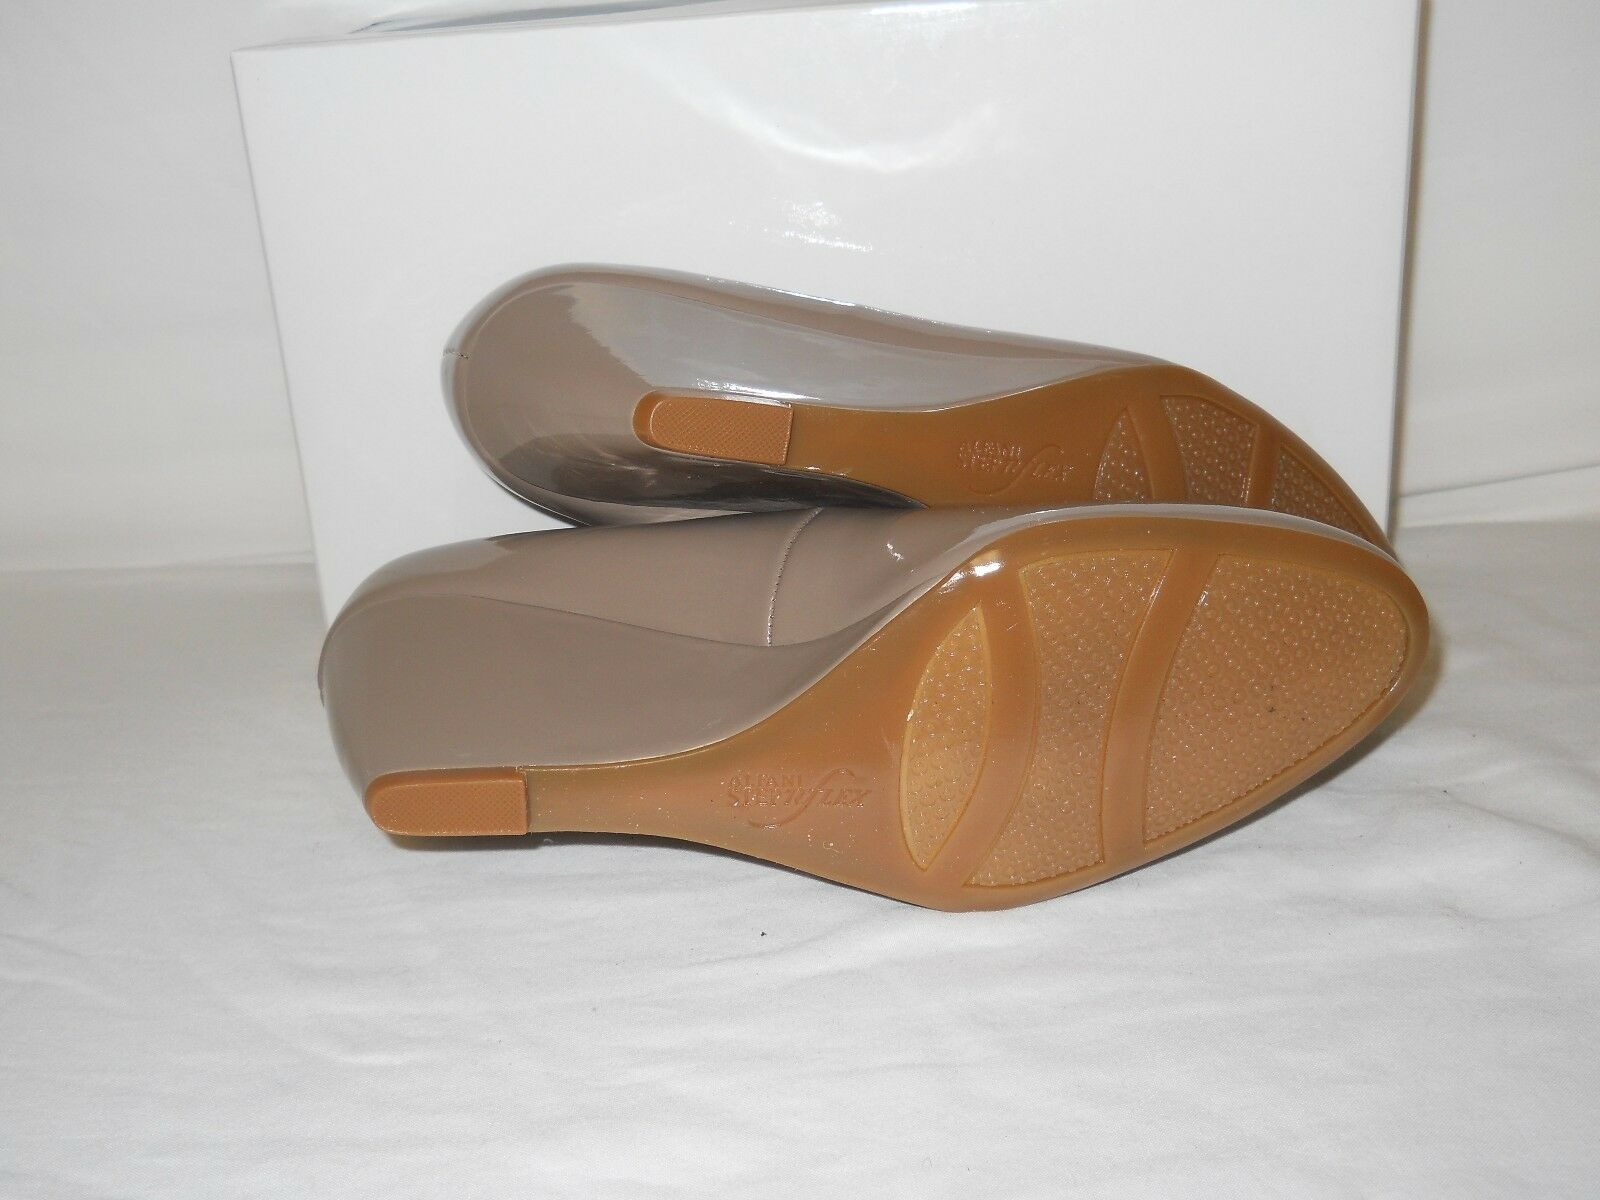 Alfani New Damenschuhe Wedge Camila Gray Truffle Patent Wedge Damenschuhe Heels 9.5 M Schuhes 78d76c